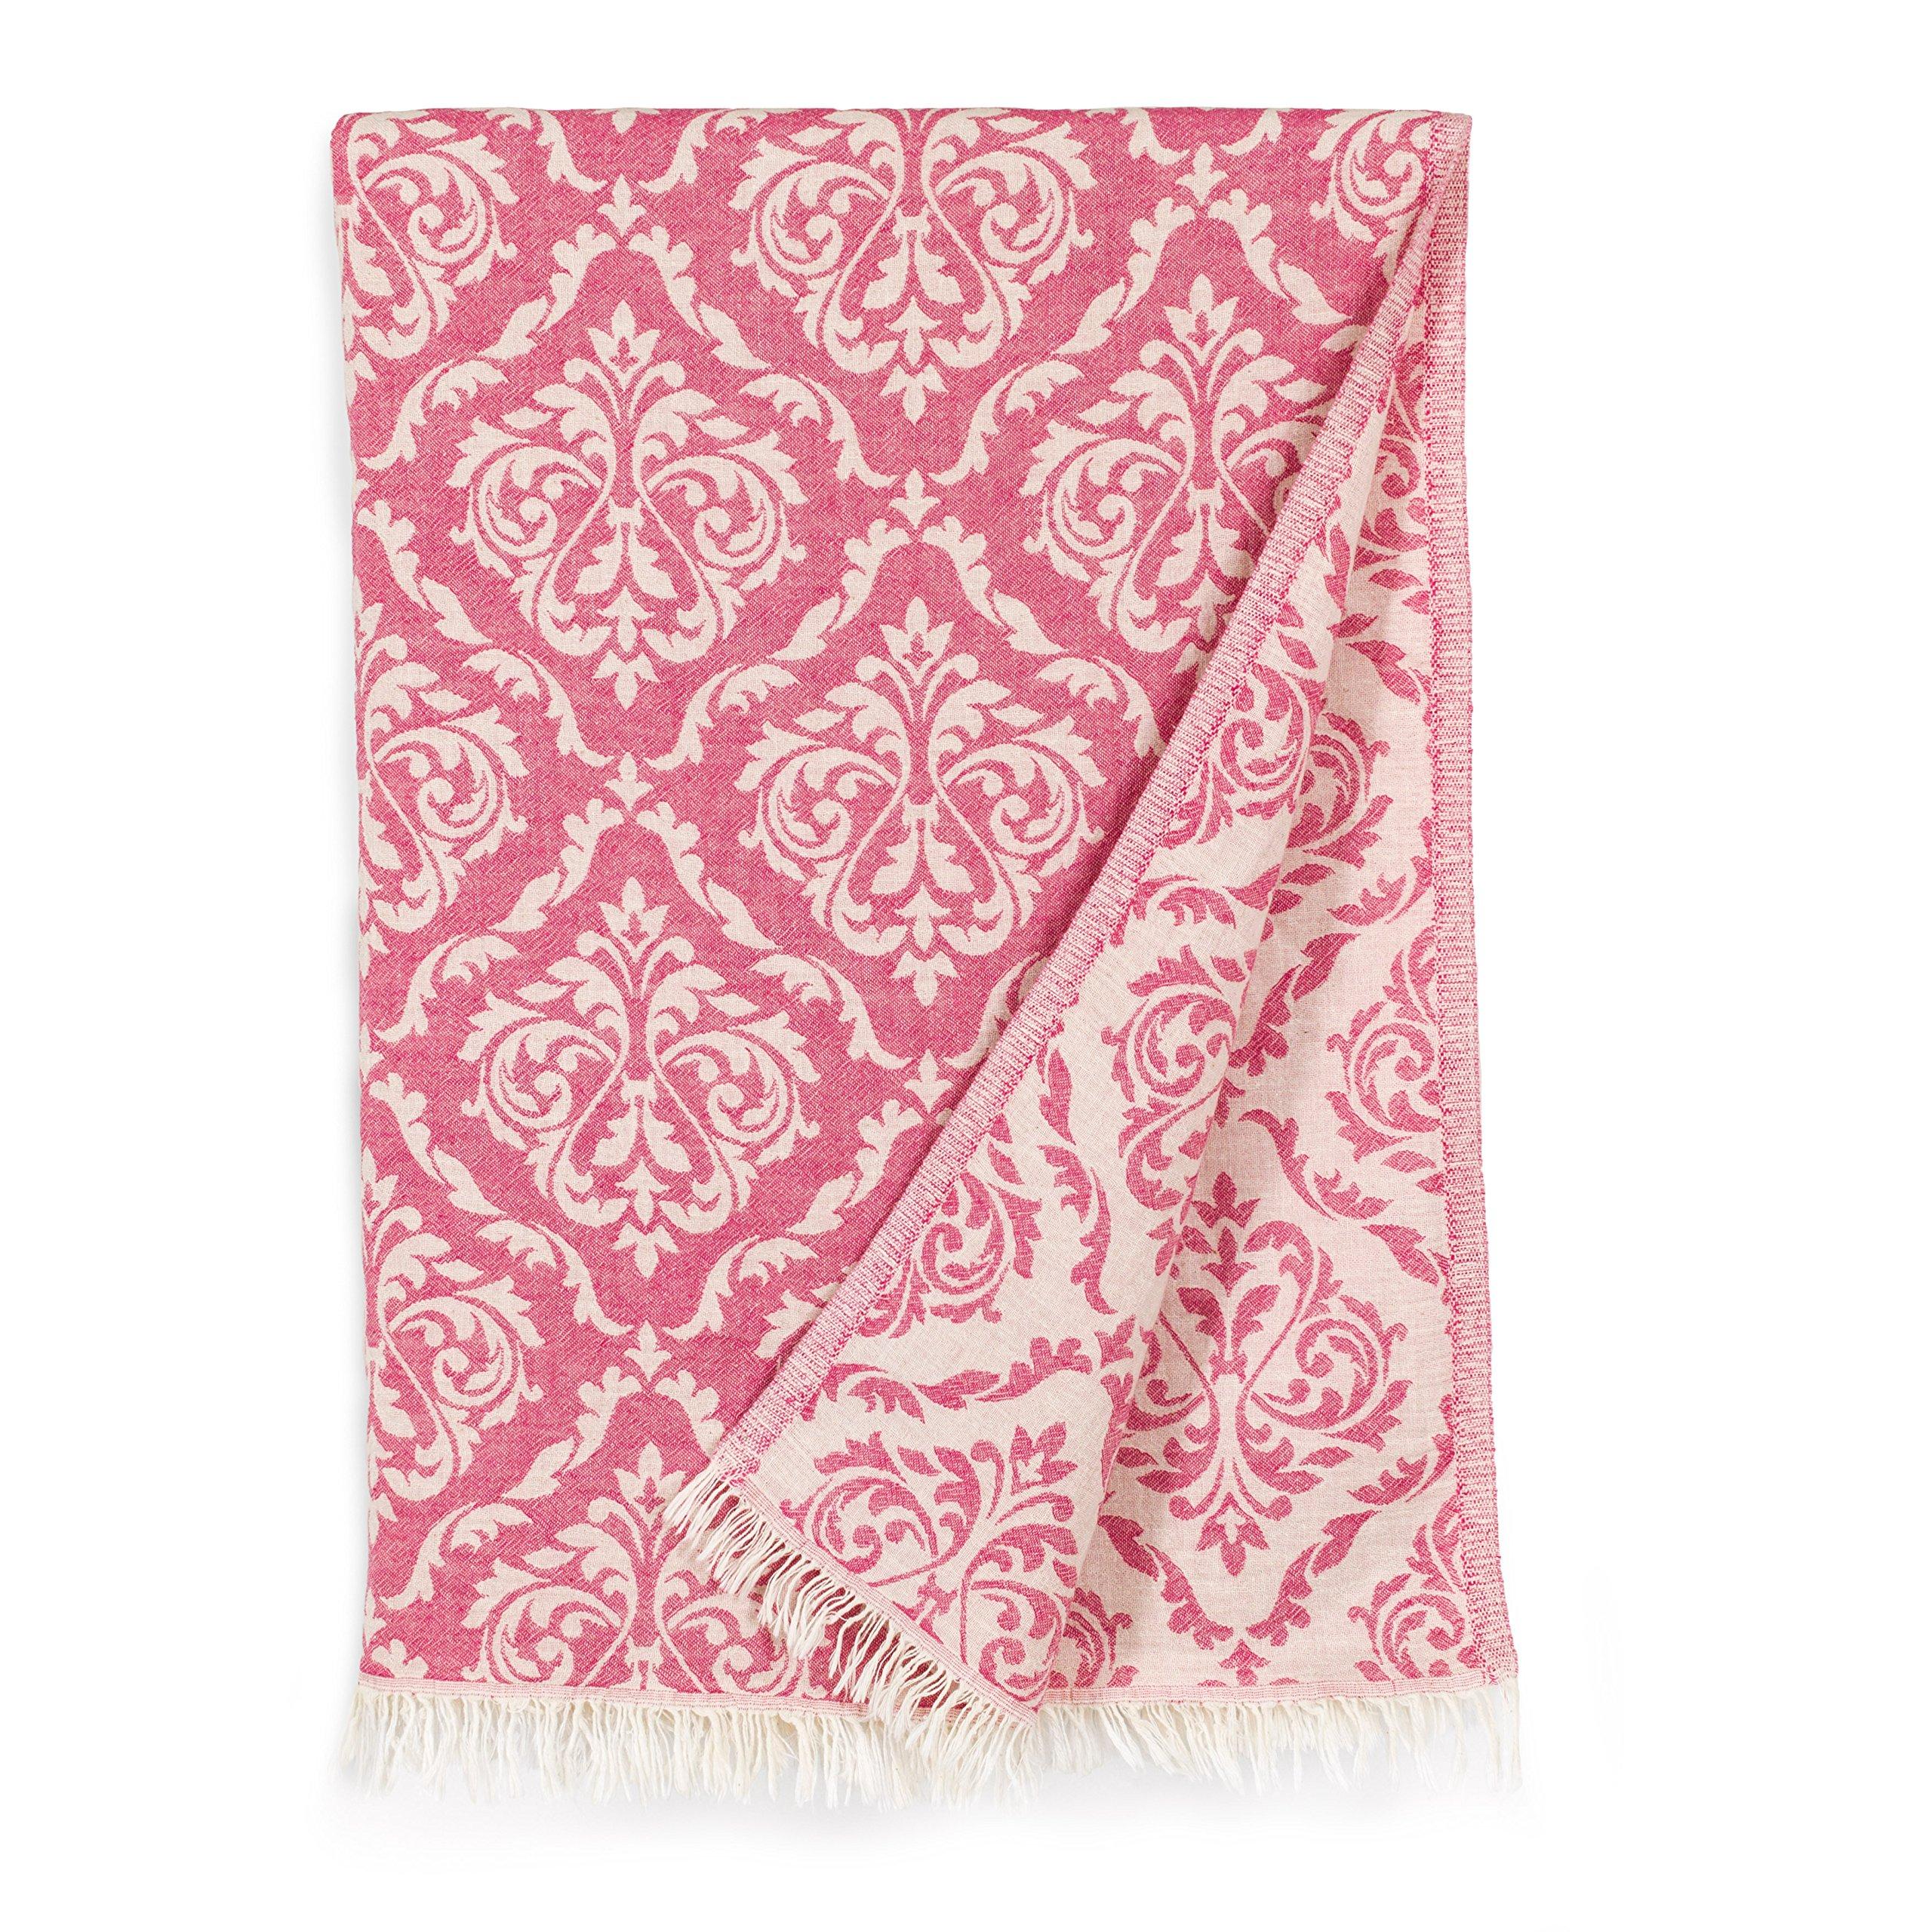 Linum Home Textiles Damask Delight Pestemal Beach Towel, Pink